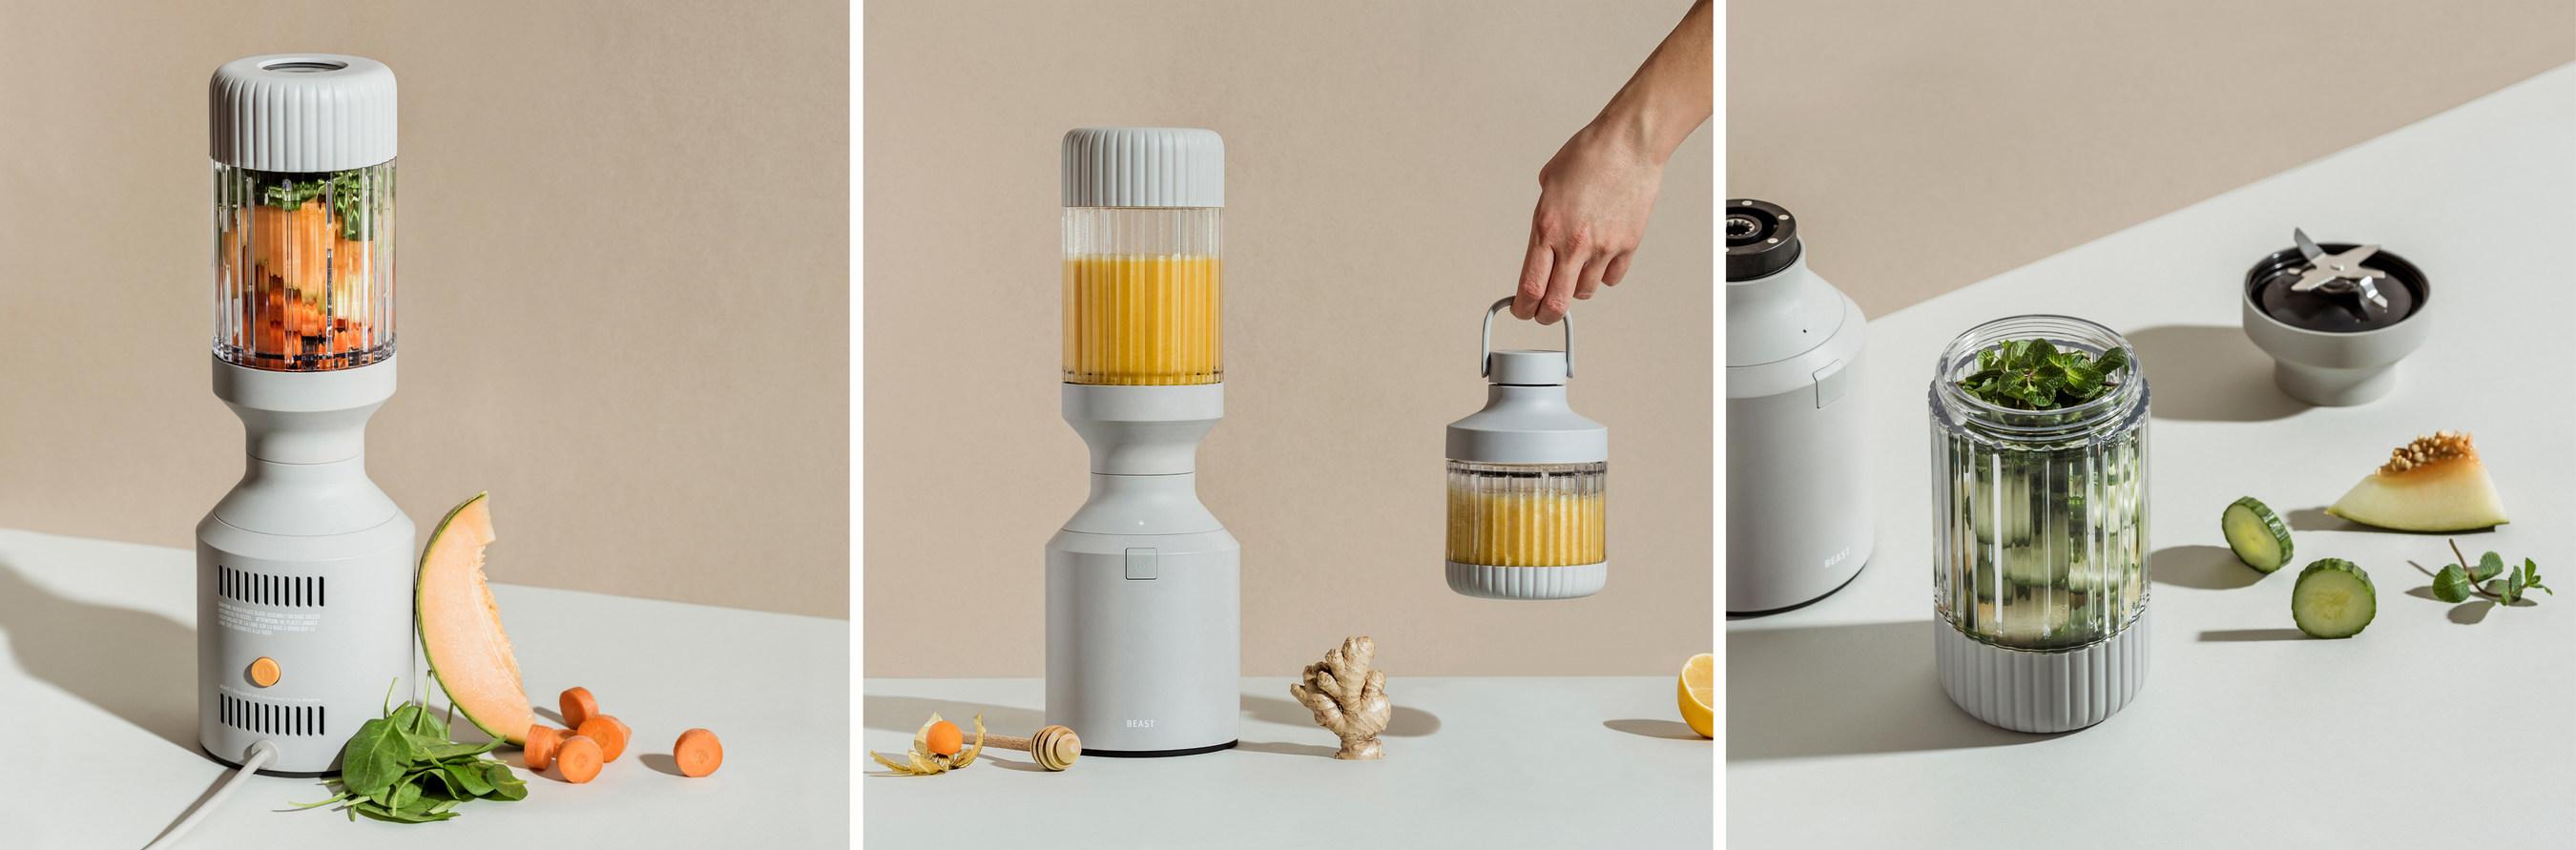 Nutribullet founder launches wellness brand